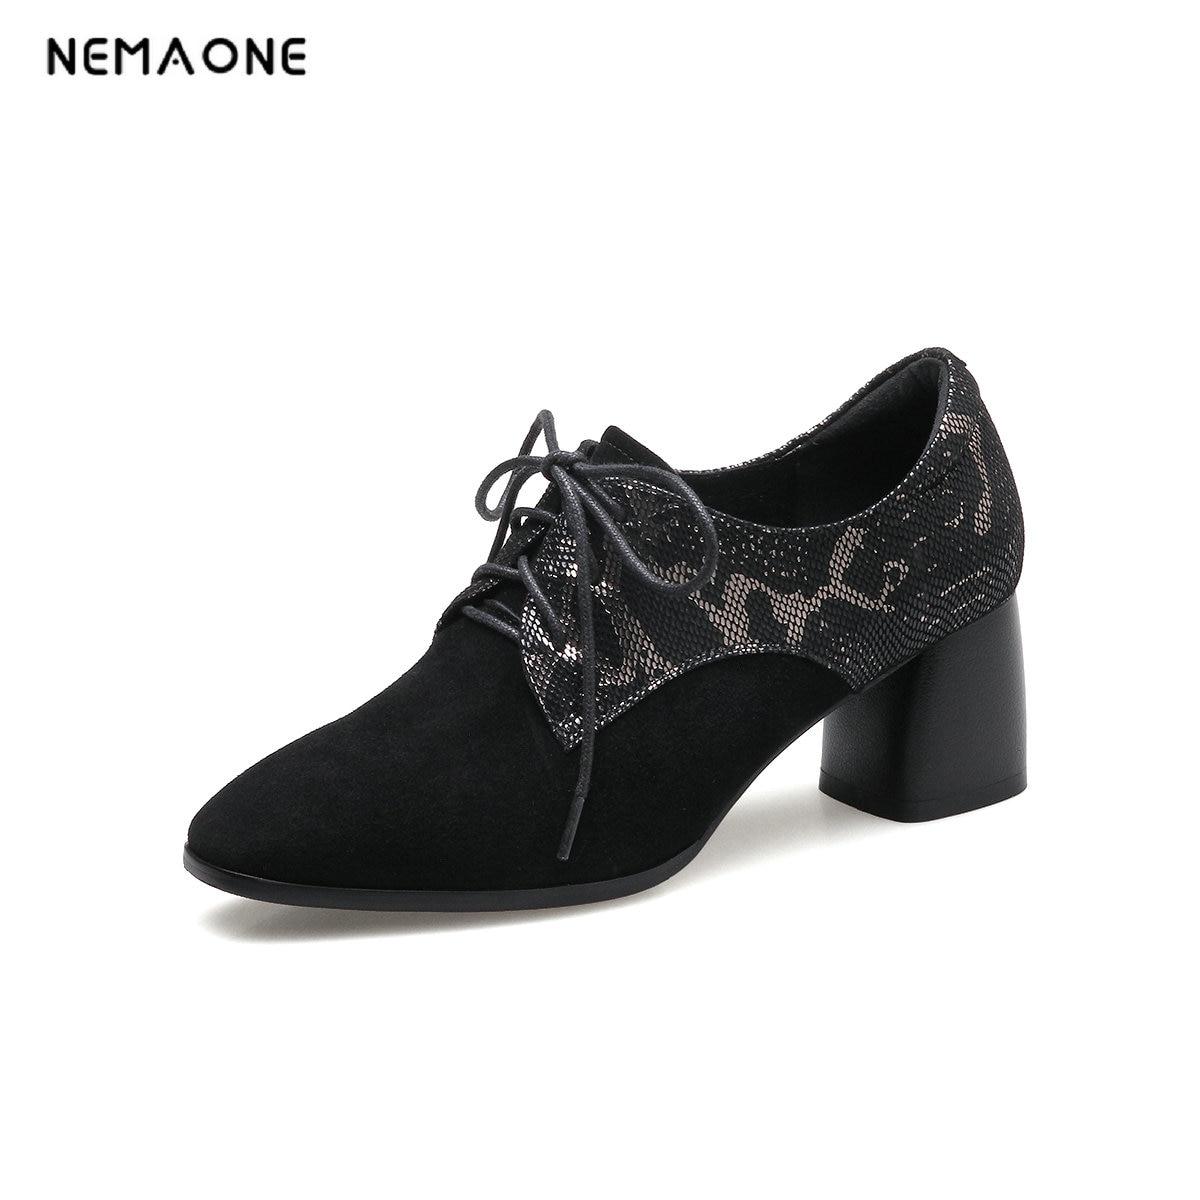 NEMAONE 2018 Big size 39-43 Lace-Up pumps Genuine leather Round Toe High heels Black Fashion Free shipping nemaone new fashion 2018 genuine leather